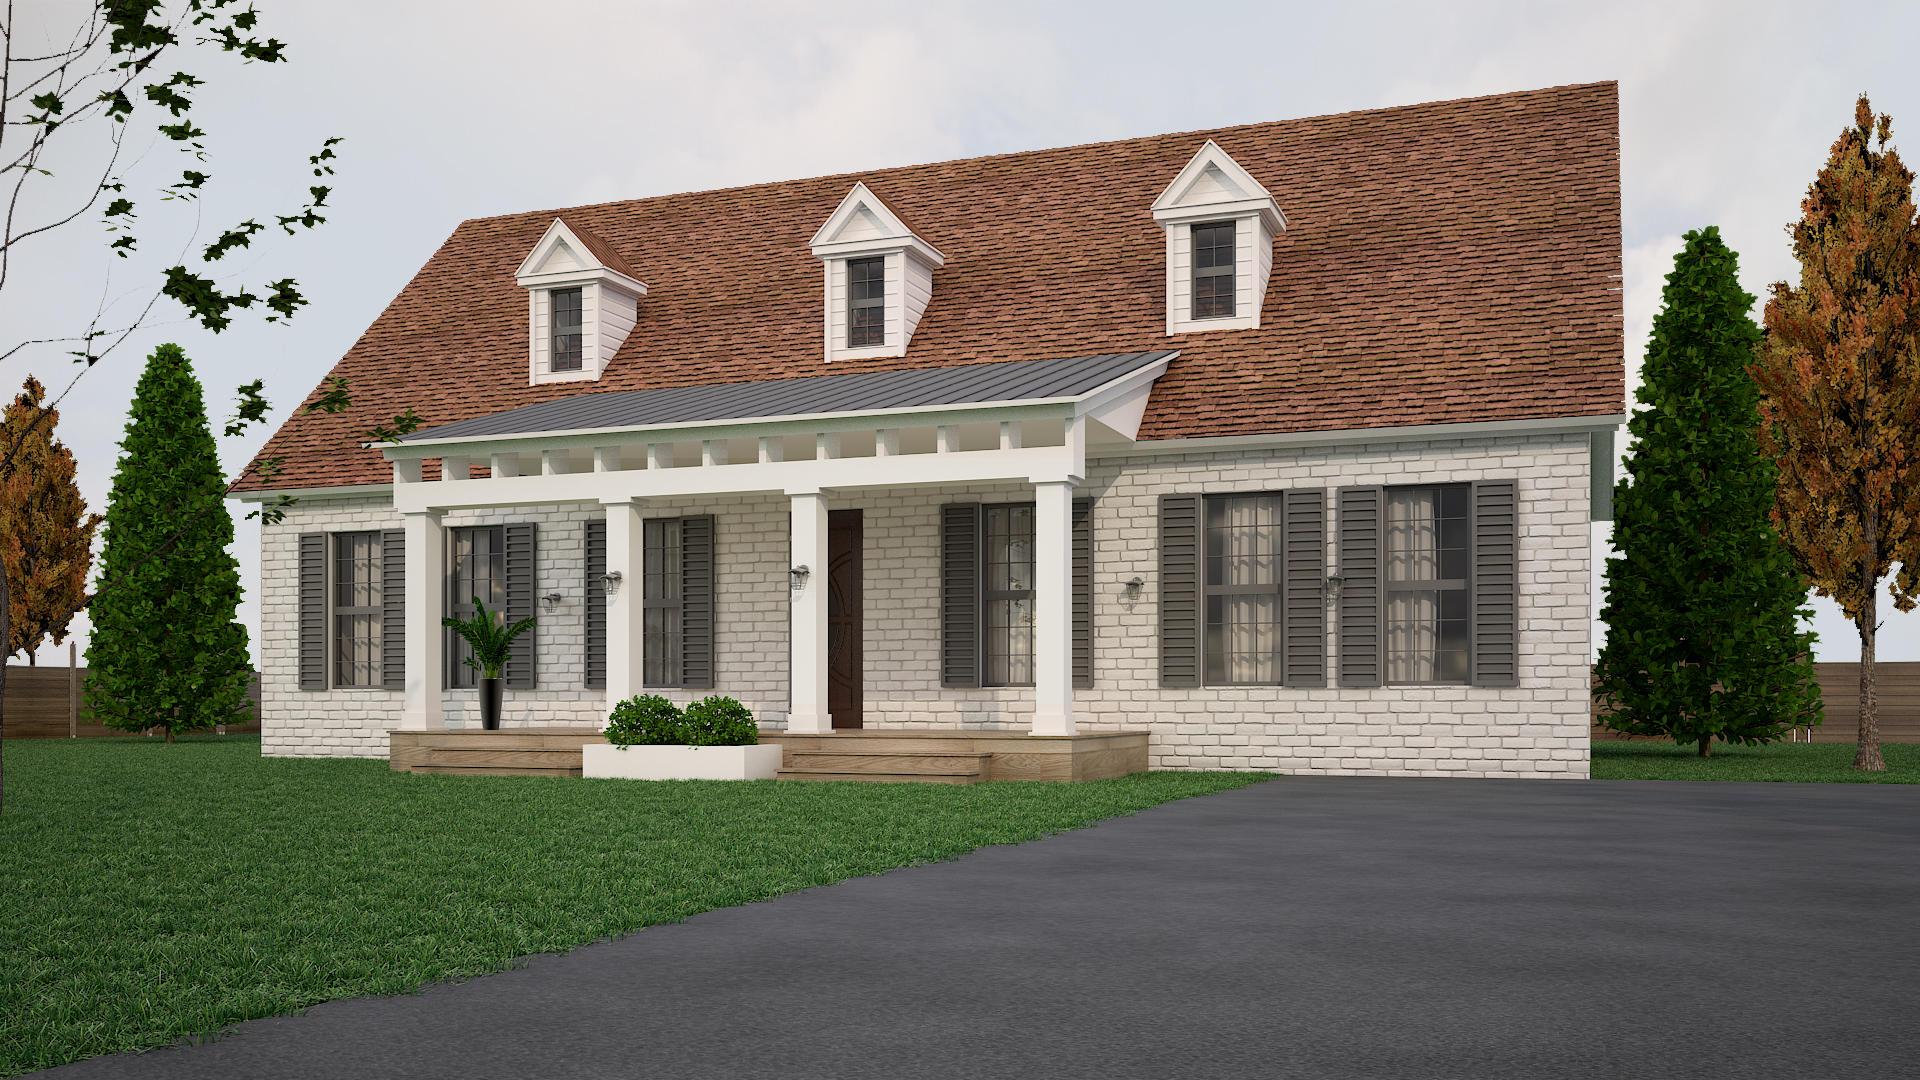 Old Mt Pleasant Homes For Sale - 1496 Goblet, Mount Pleasant, SC - 34